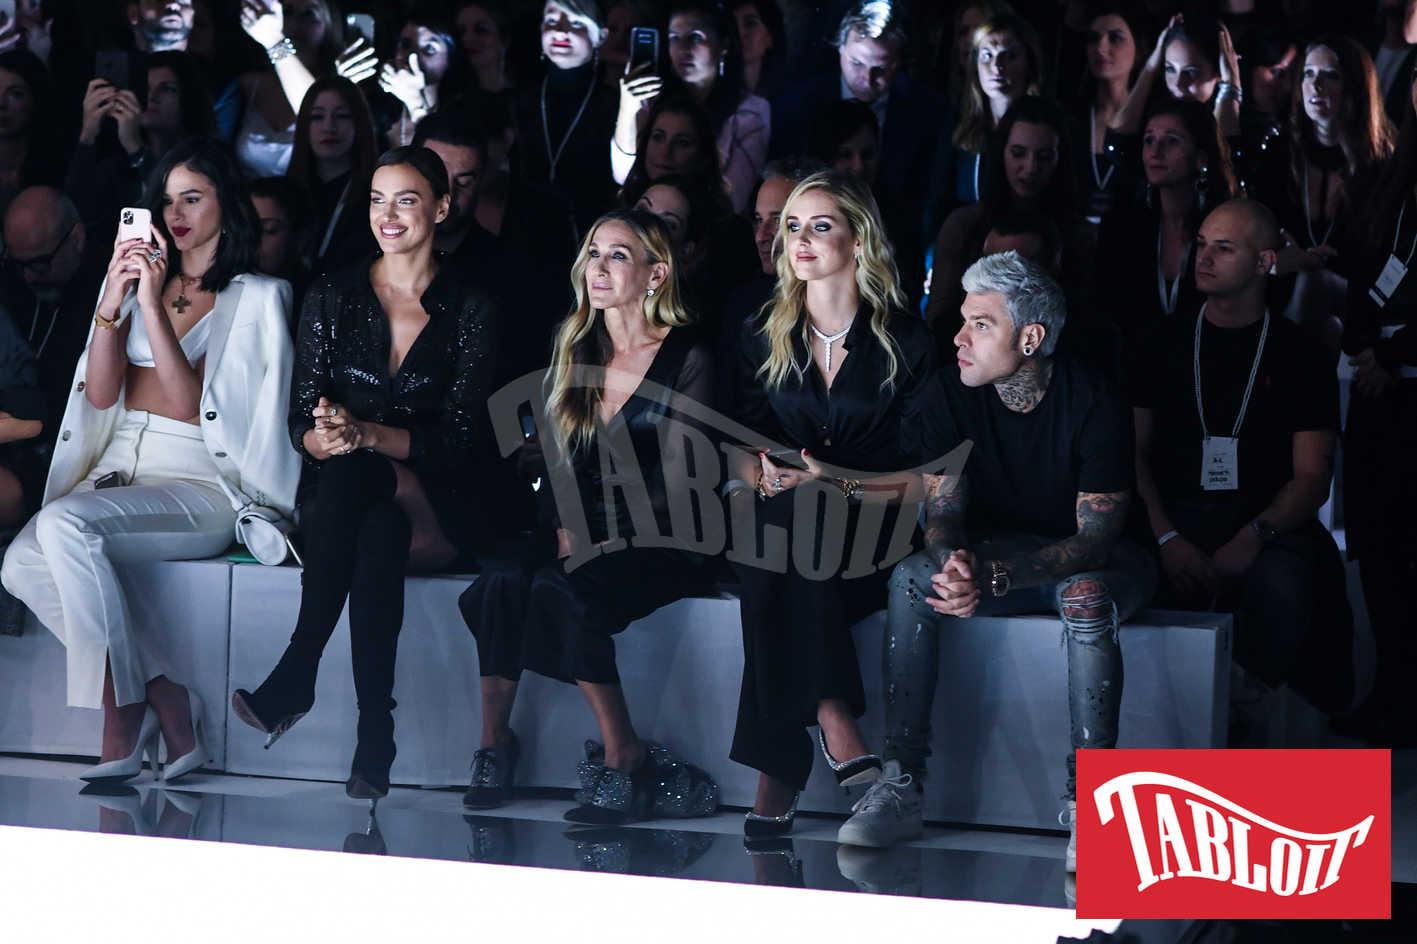 Irina Shayk, Sarah Jessica Parker, Chiara Ferragni e Fedez alla sfilata di intimissimi